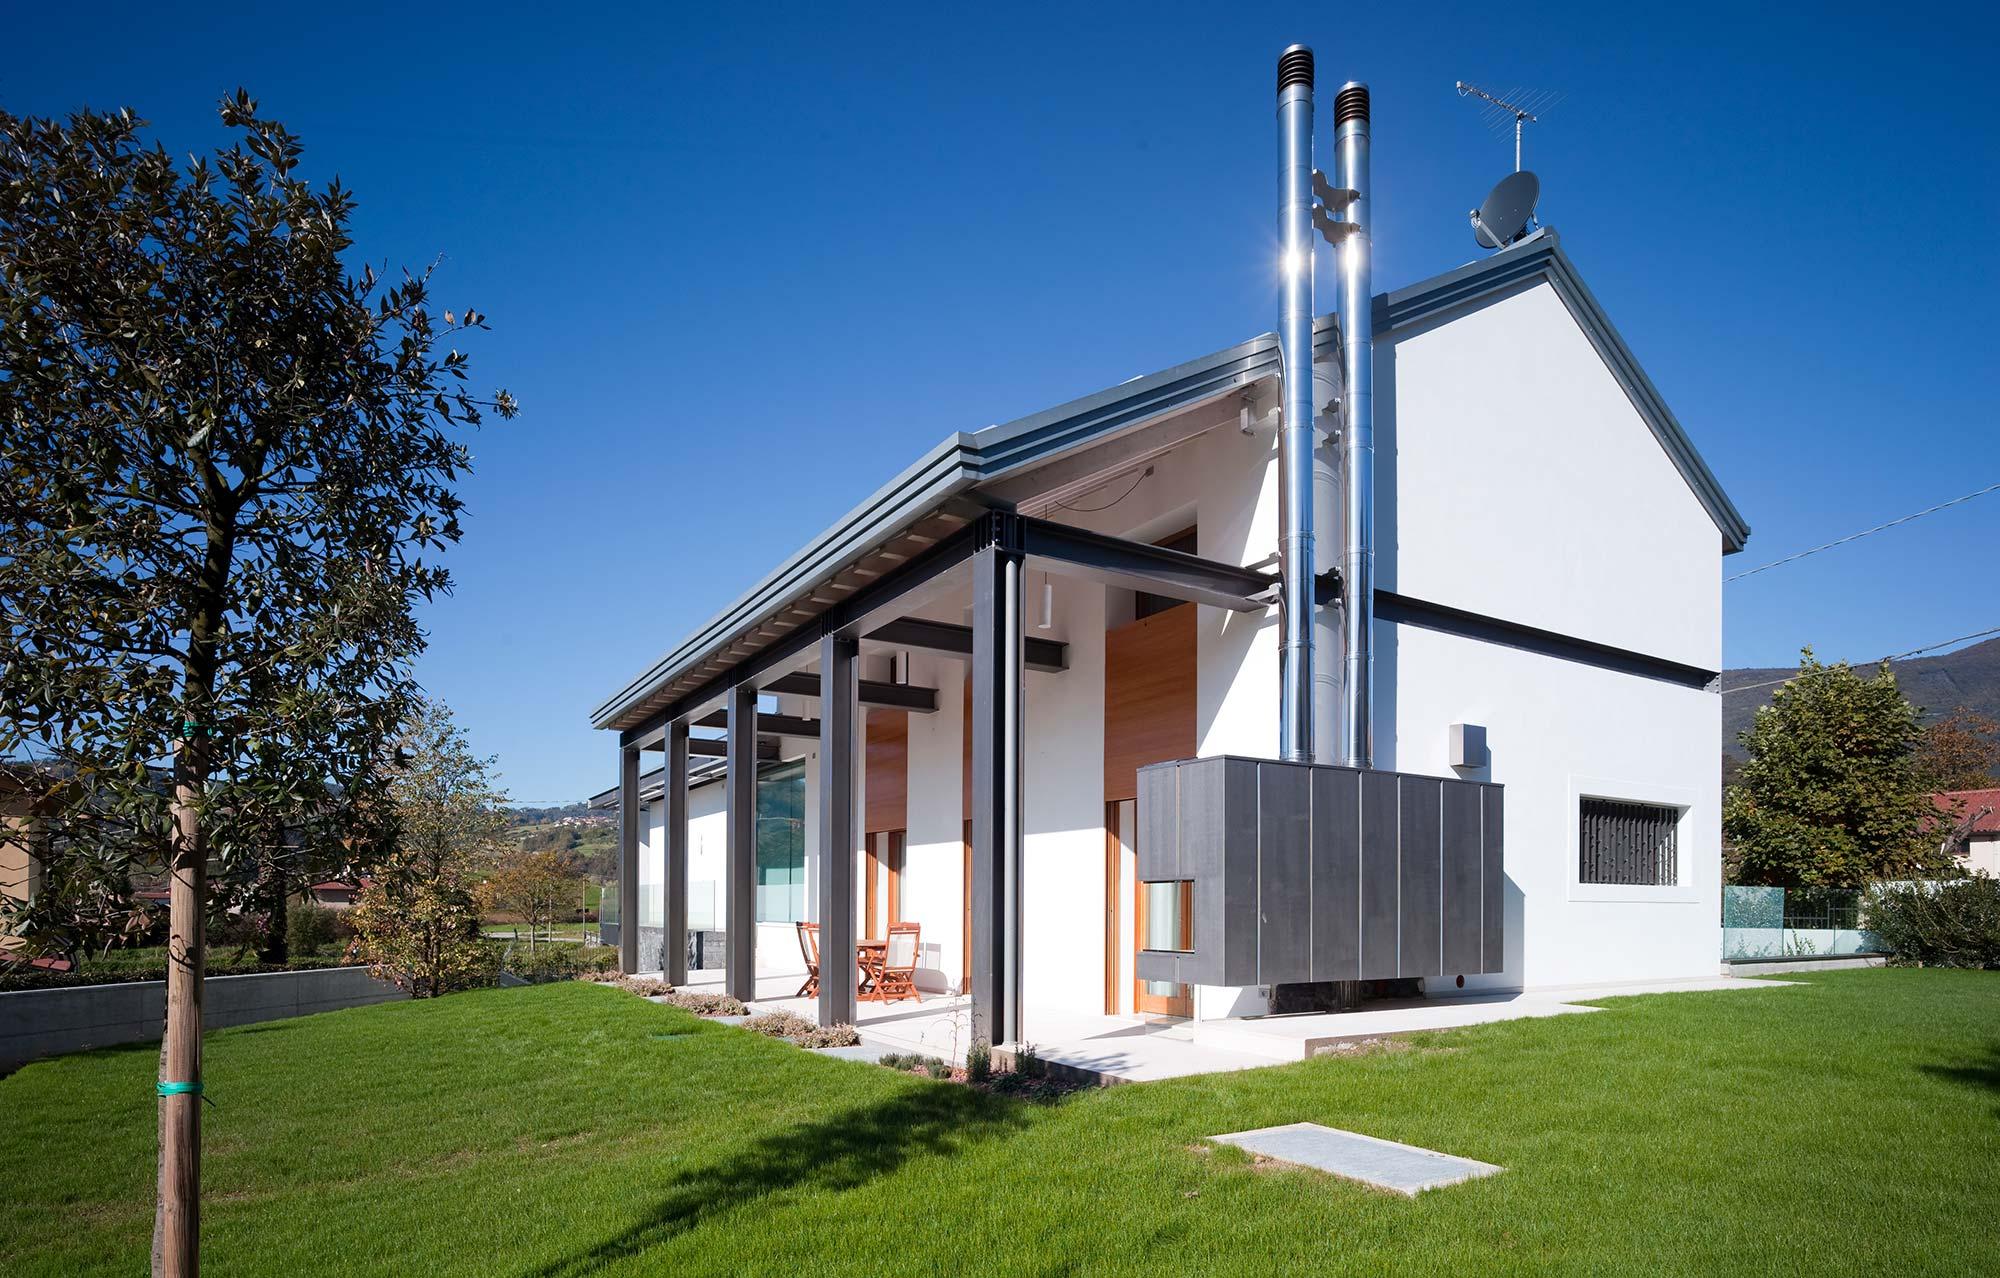 wood-fireplace-passiv-house-1